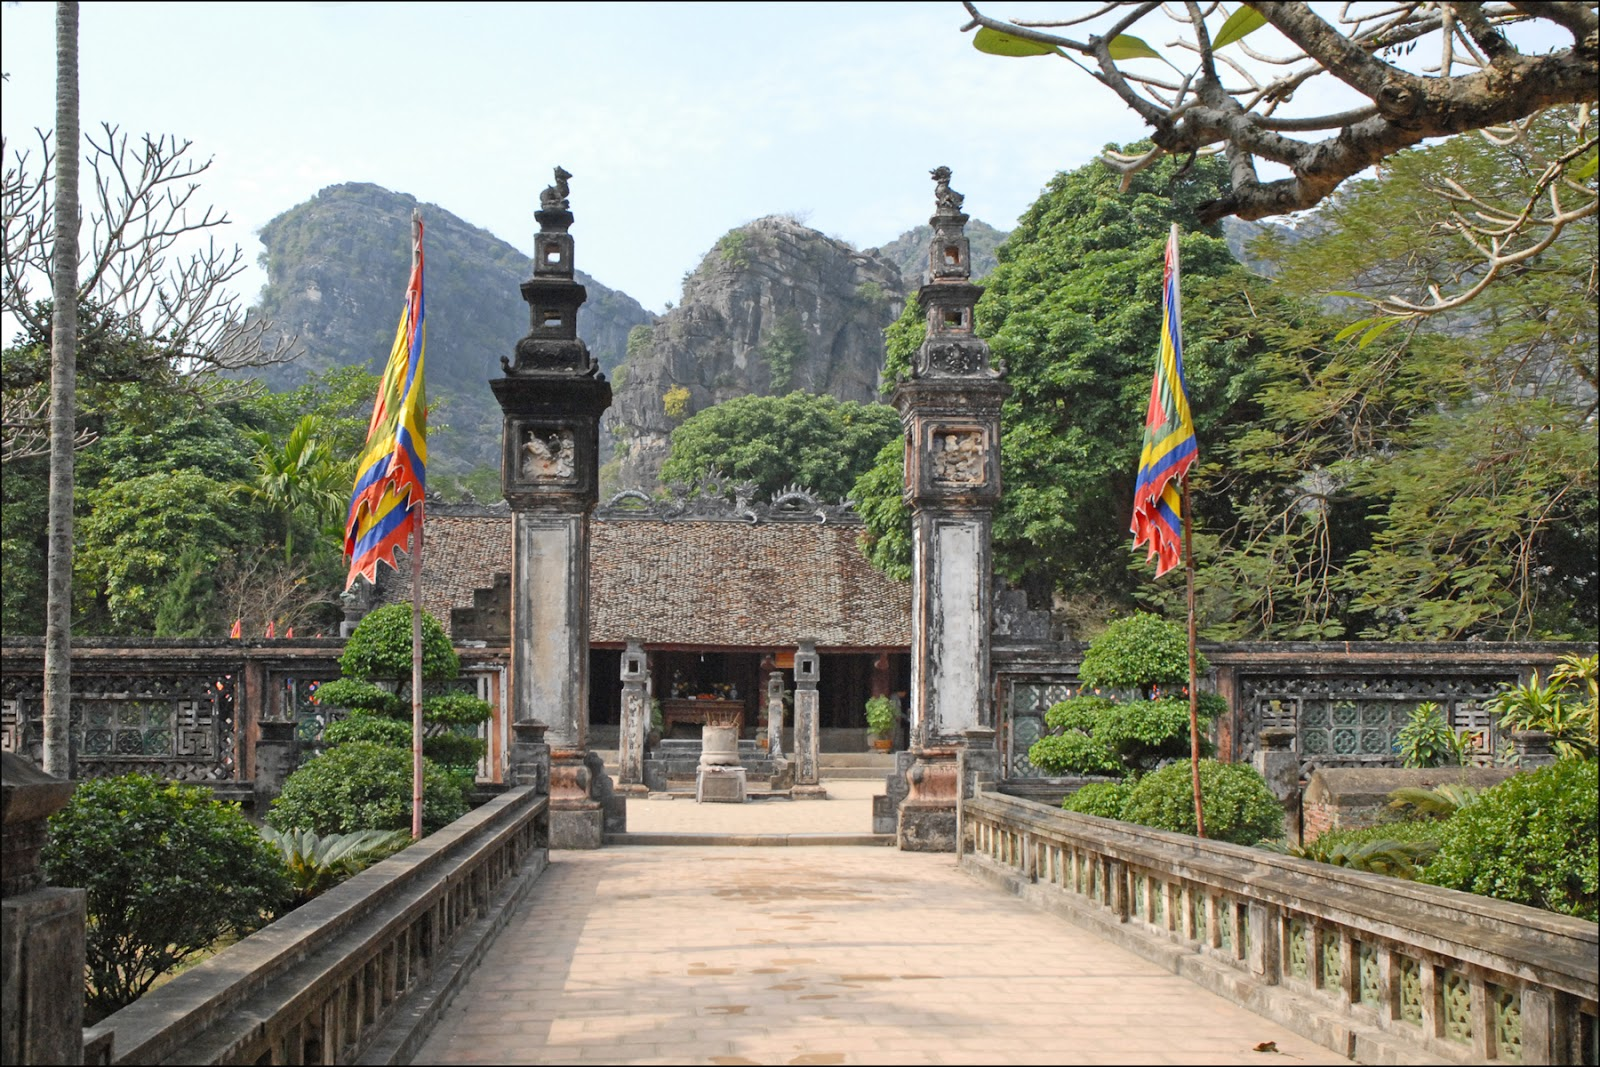 Temple_commémoratif_au_roi_Dinh_Tien_Hoang_(Hoa_Lu).jpg